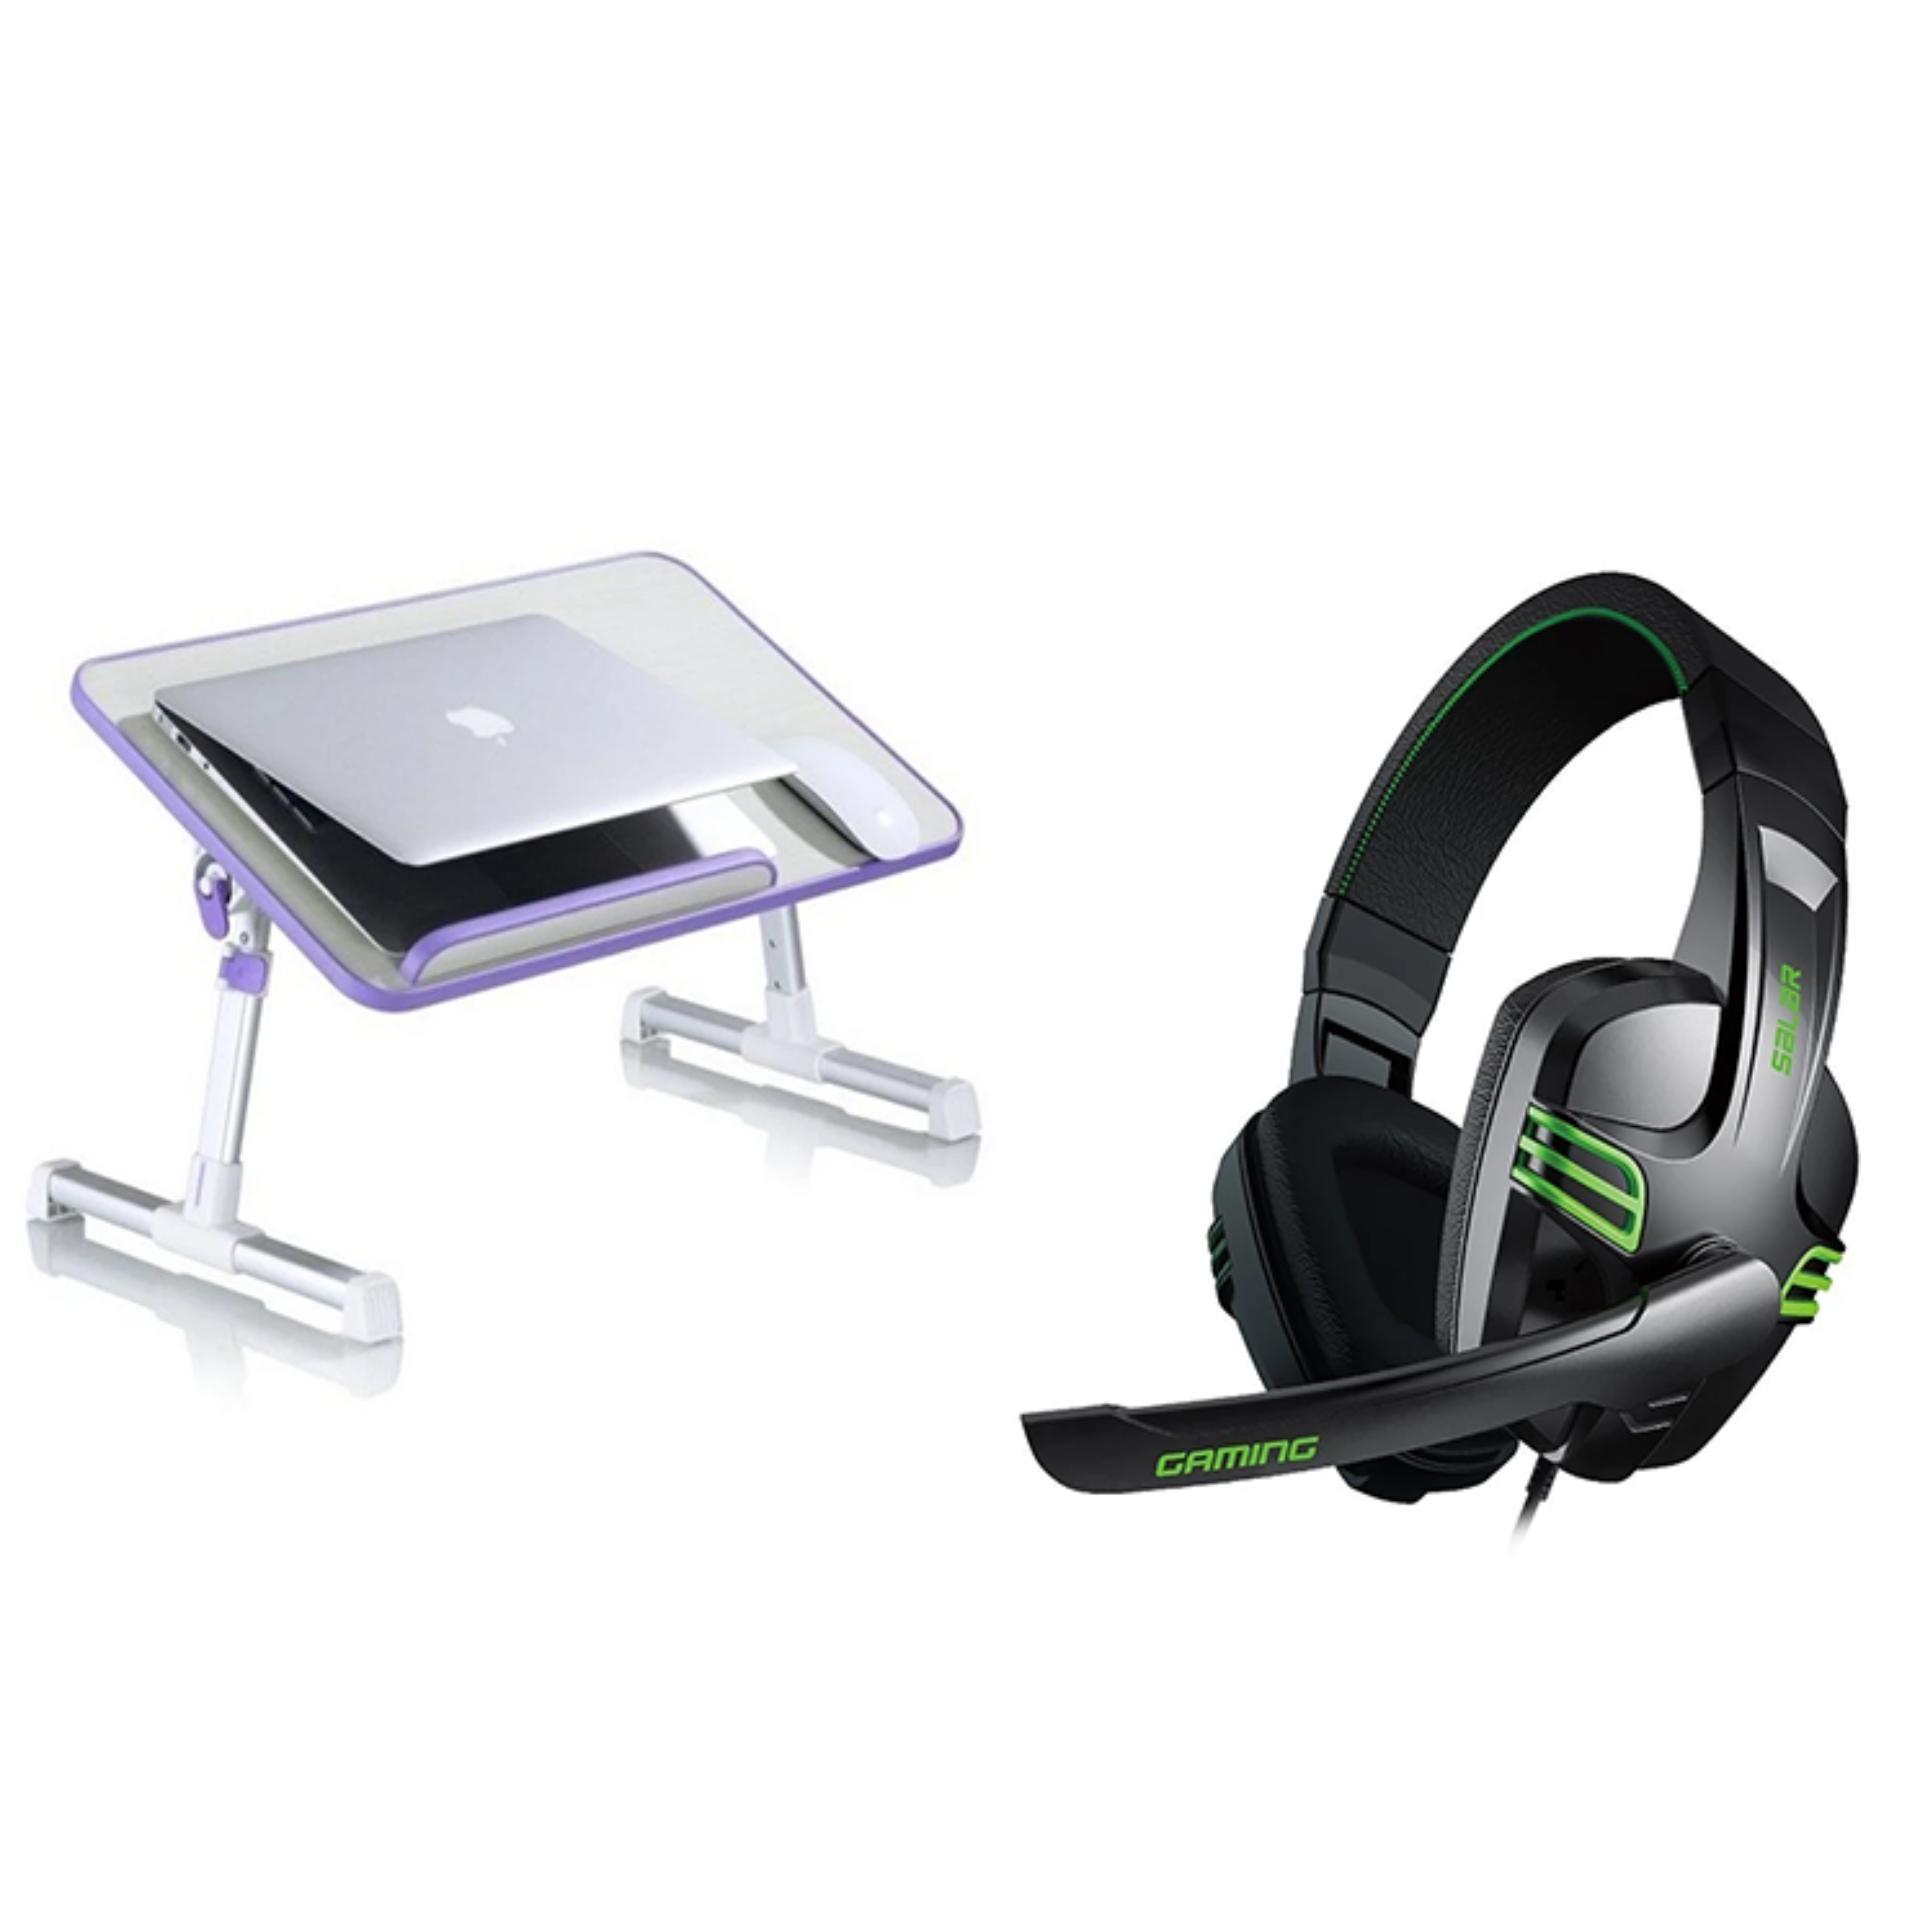 A8 Ergonomic Multi Function Cooling Fan Laptop Desk Bed Tablefolding Table With Salar Kx